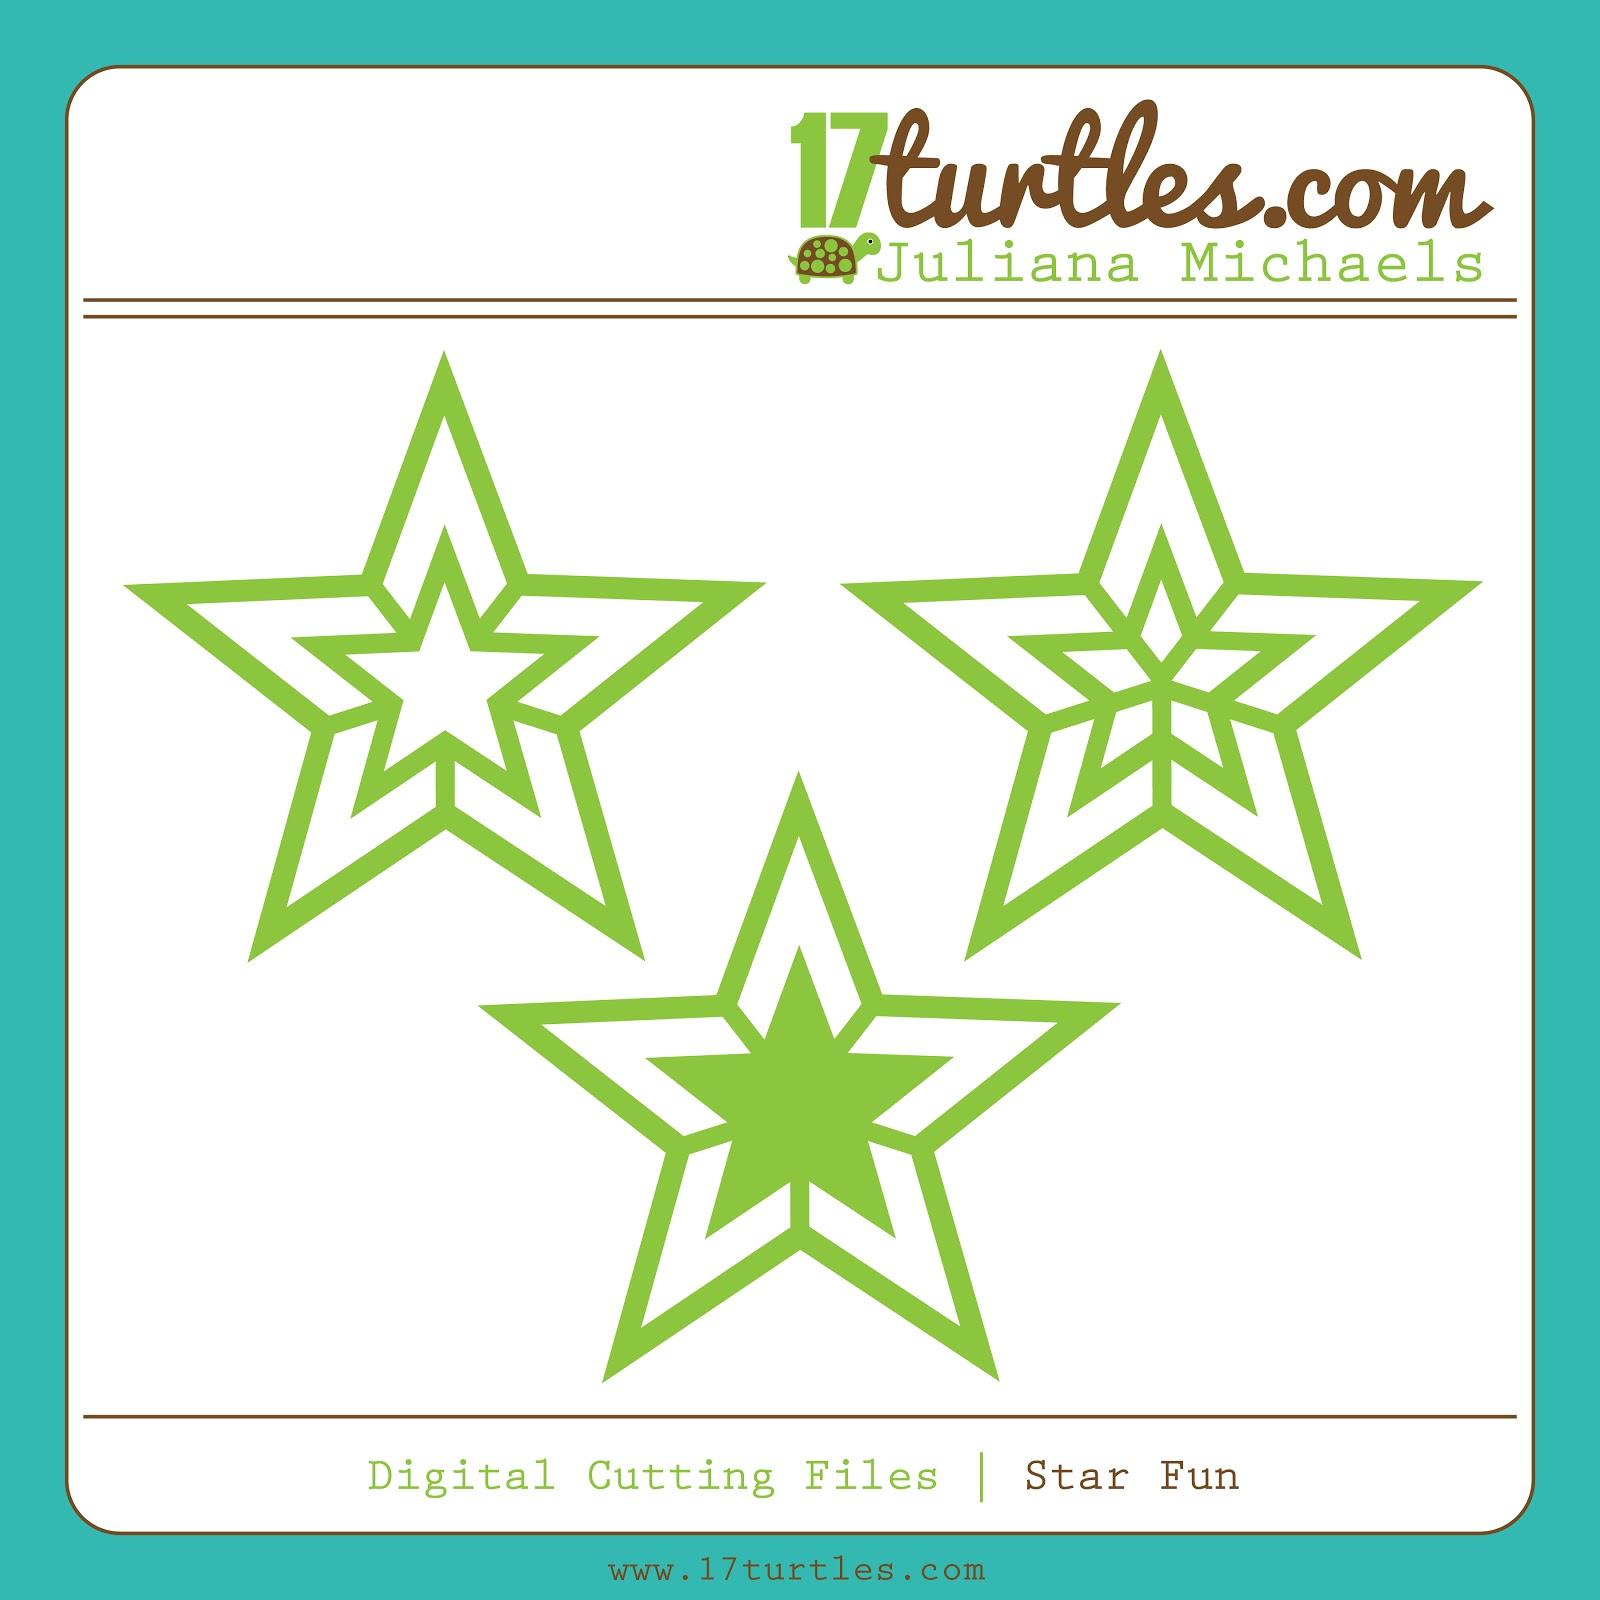 Star Fun FREE Digital Cut File by Juliana Michaels 17turtles